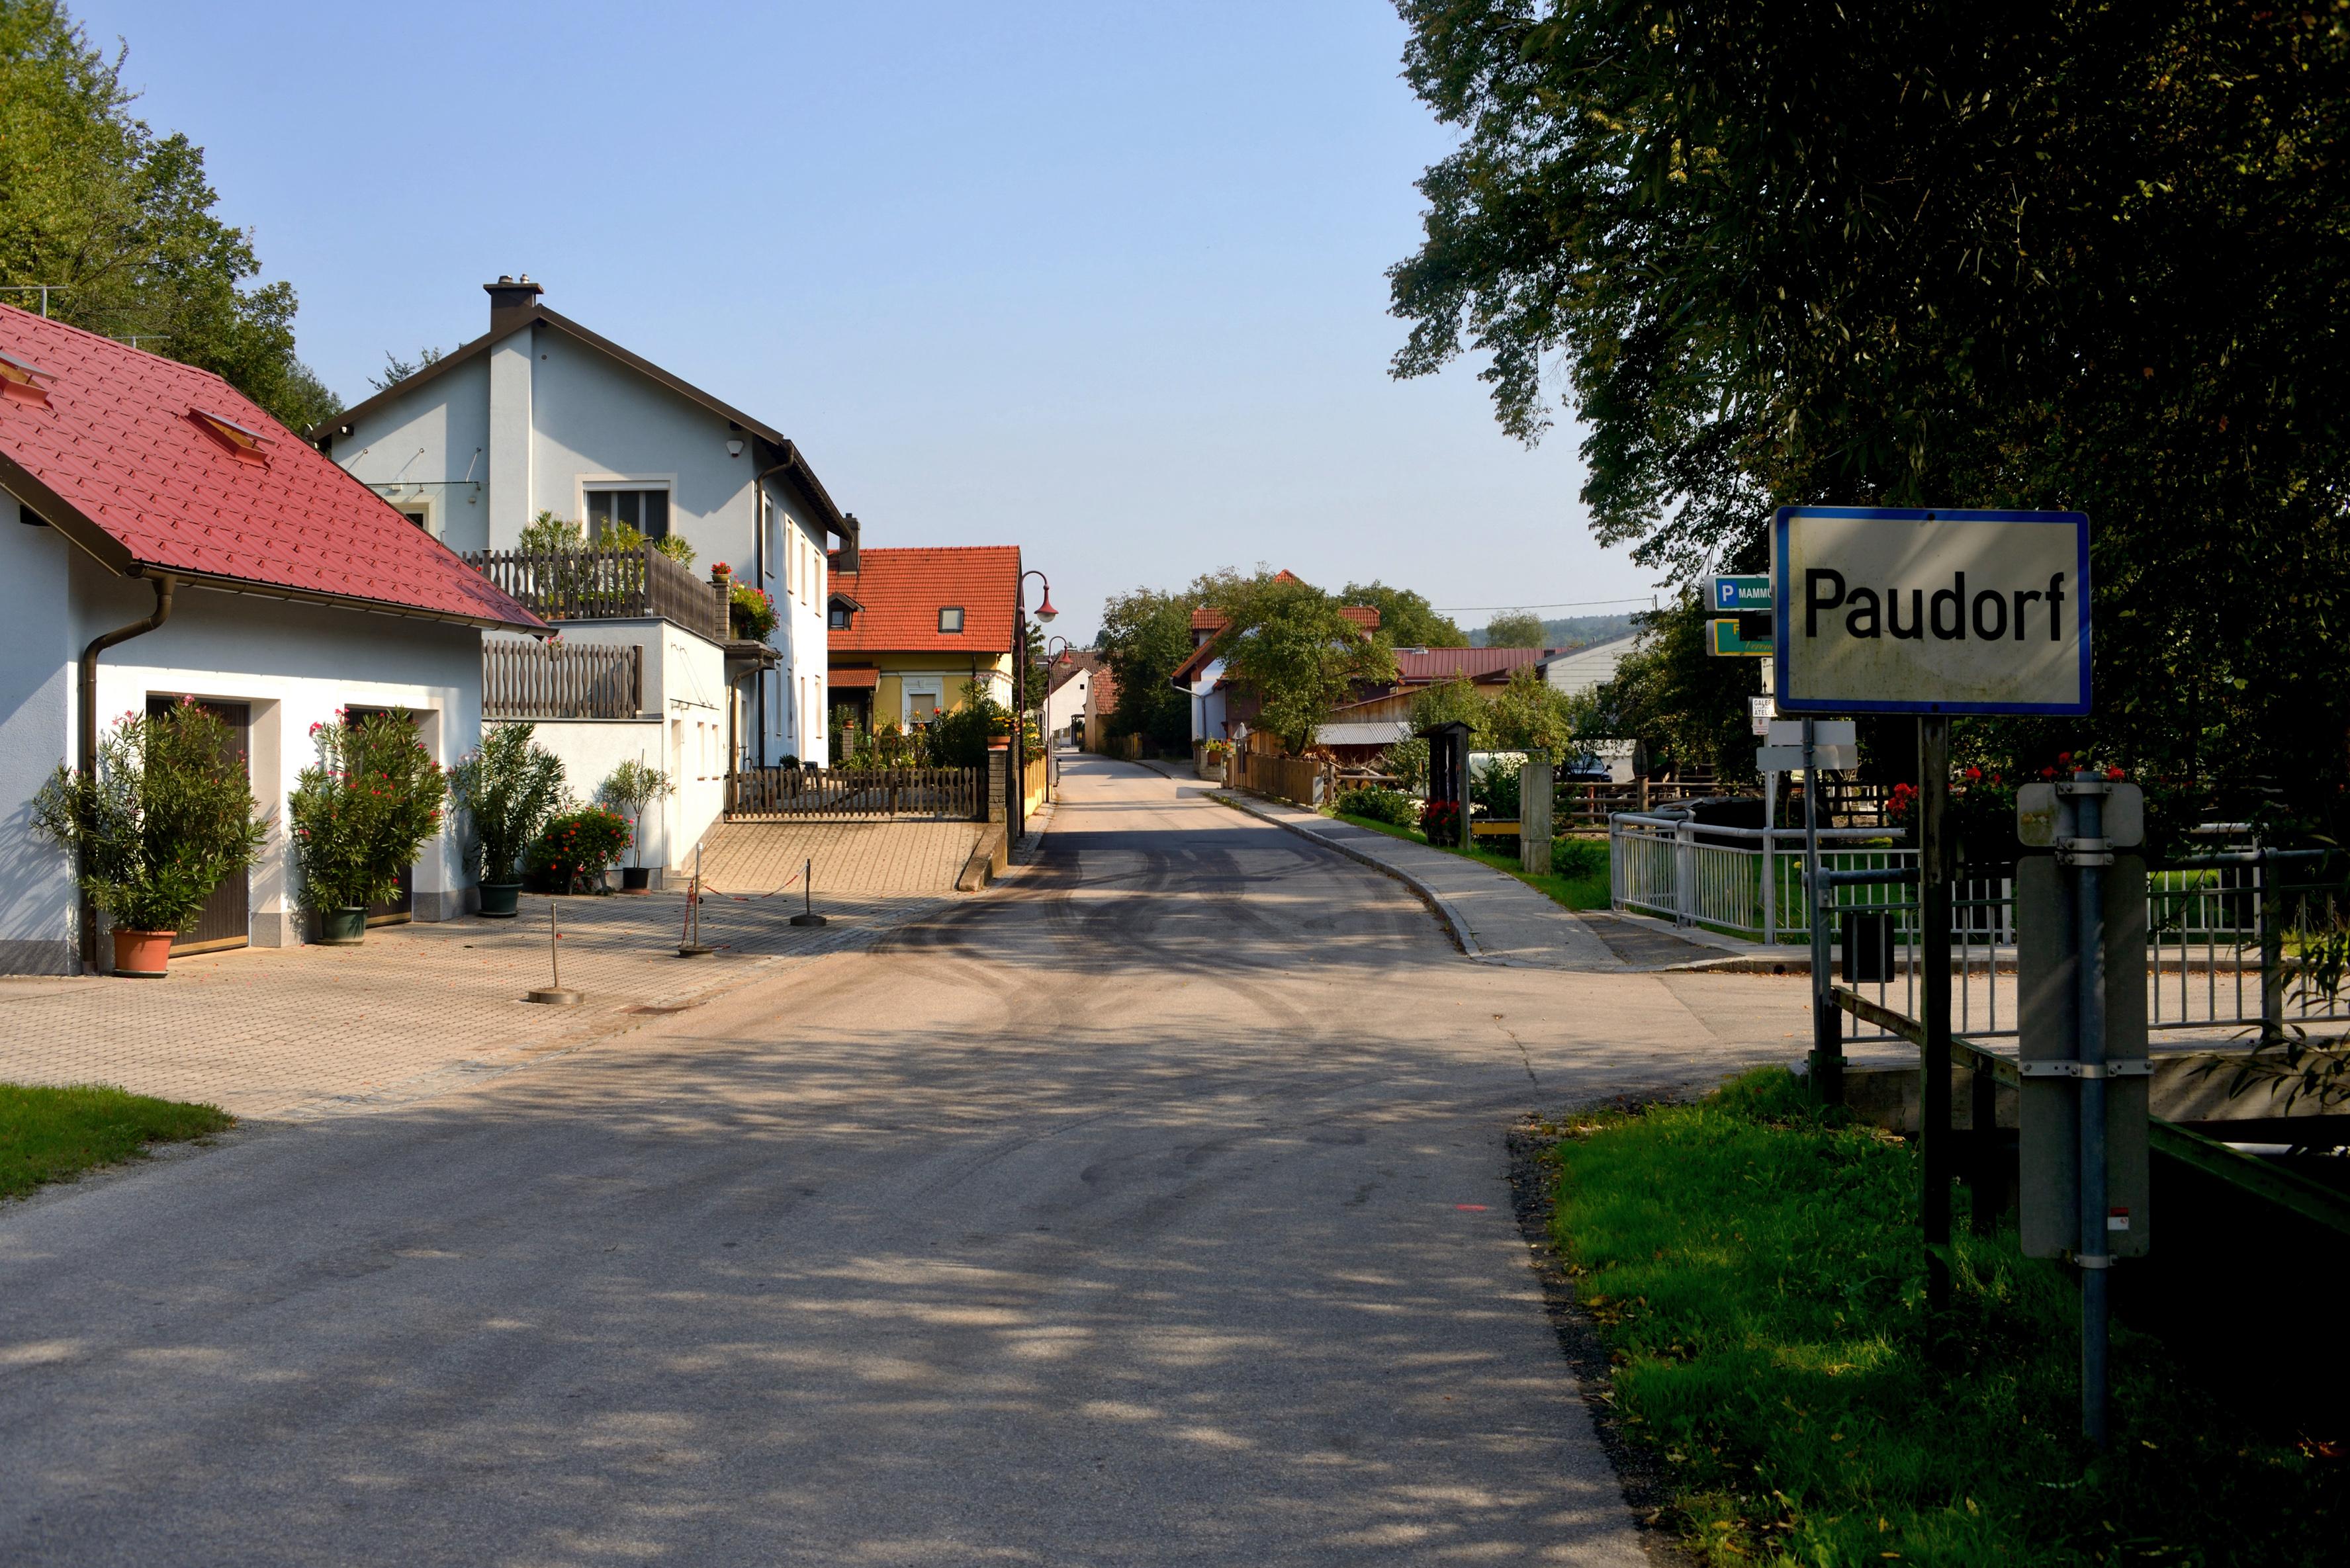 File Paudorf Ortstafel Jpg Wikimedia Commons